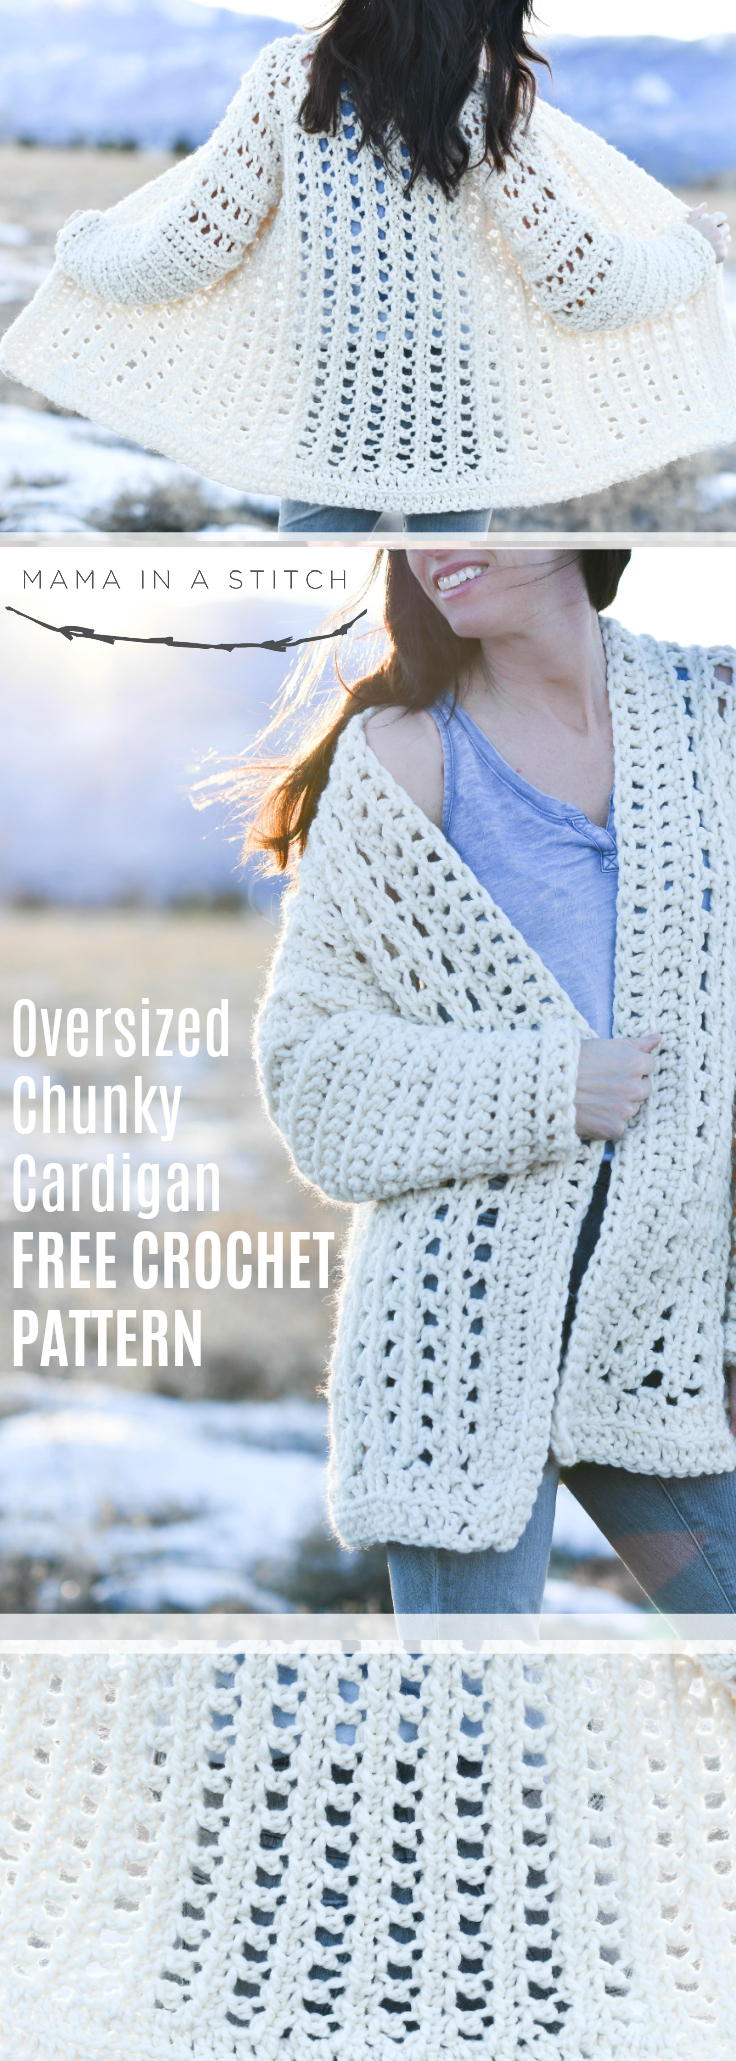 Light Snow Oversized Cardigan Crochet Free Pattern Mama In A Stitch